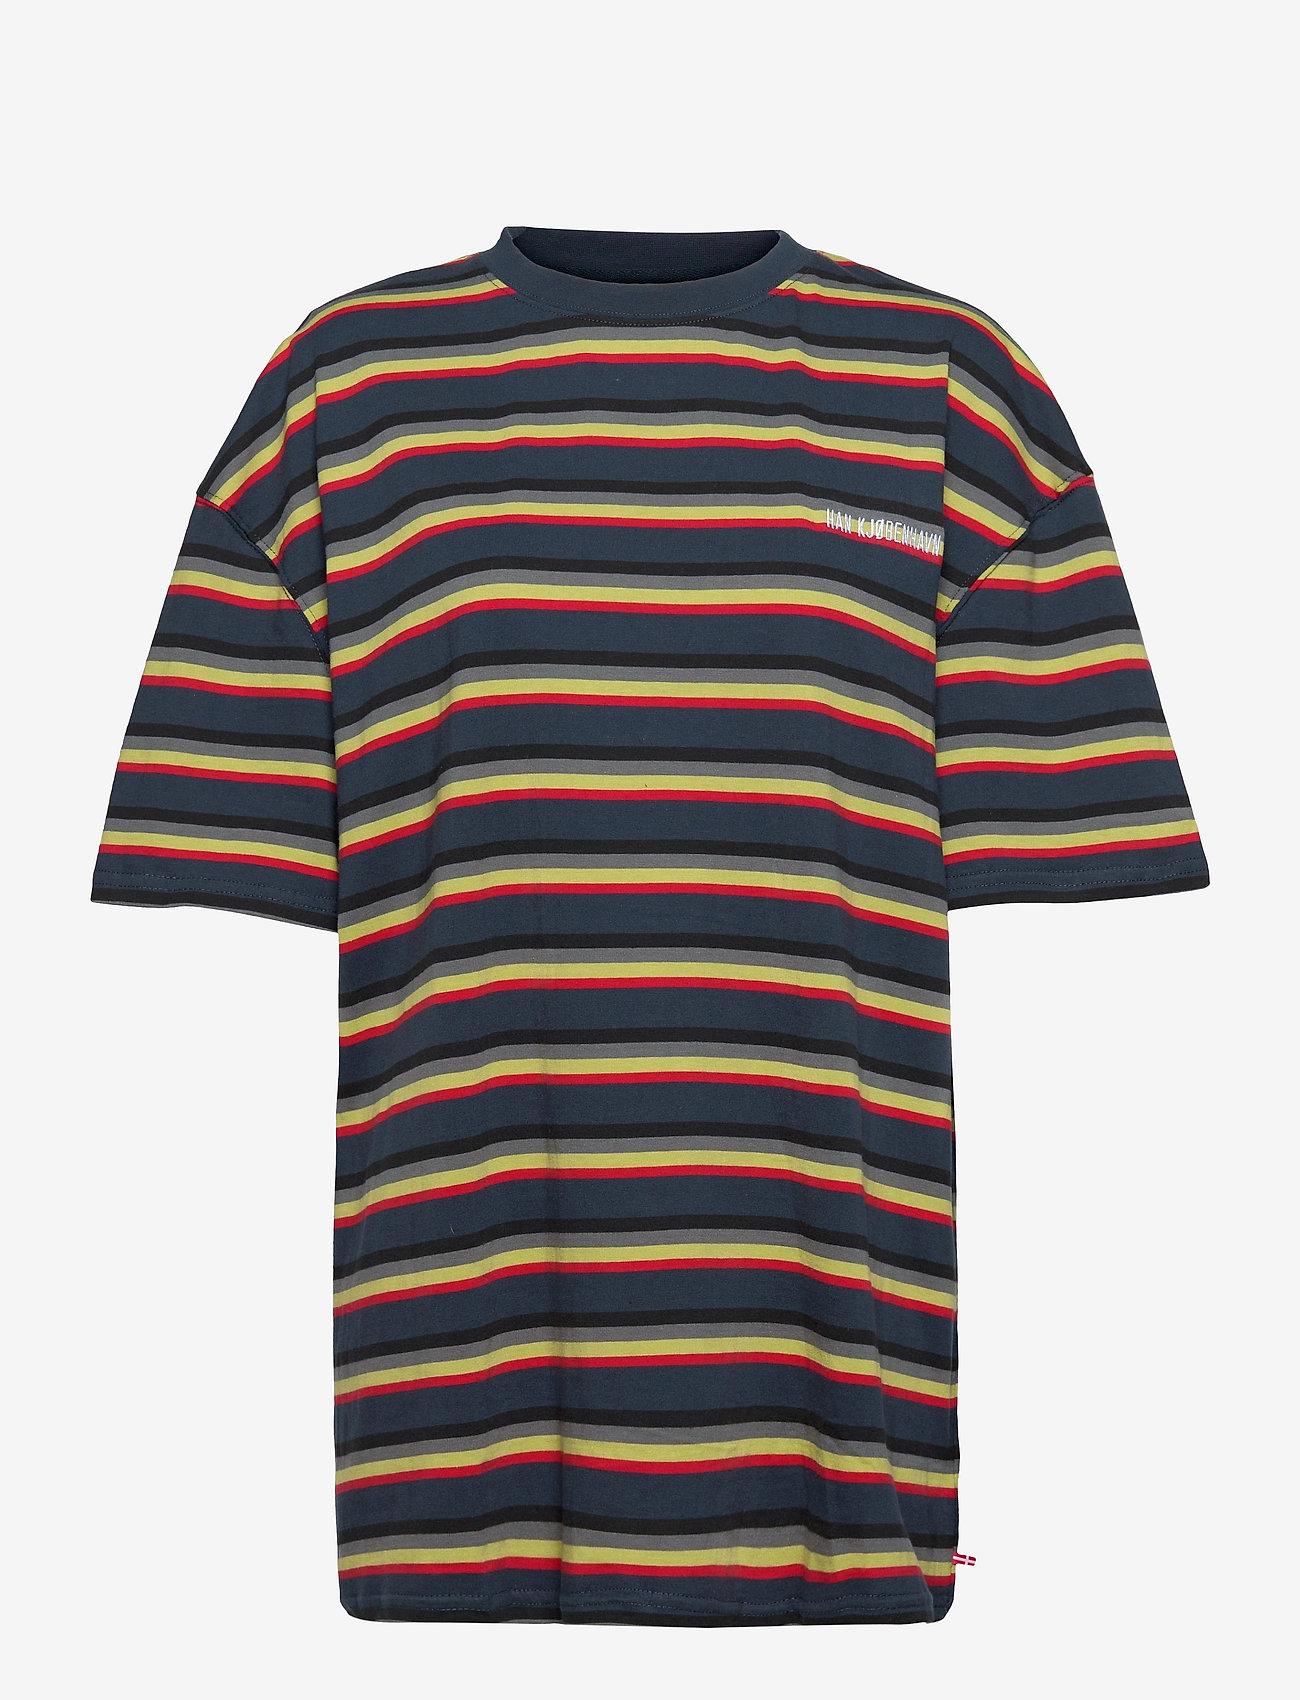 HAN Kjøbenhavn - Boyfriend Tee - t-shirts - blue stripe - 0